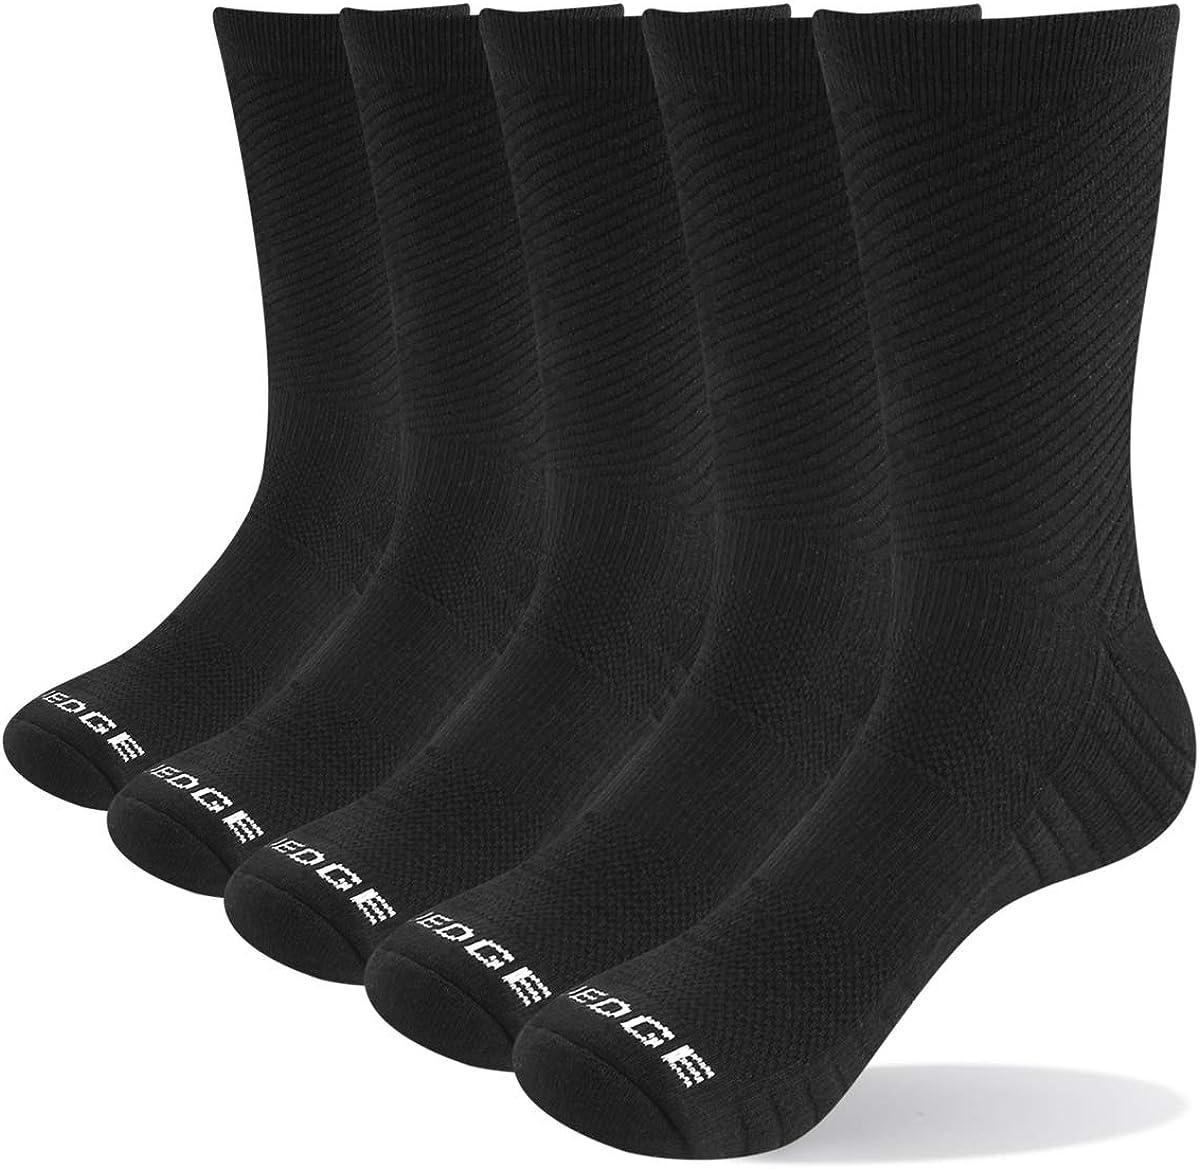 Women/'s Grey Crew Athletic Socks Super Soft Durable Casual Cotton Socks 6 Pairs